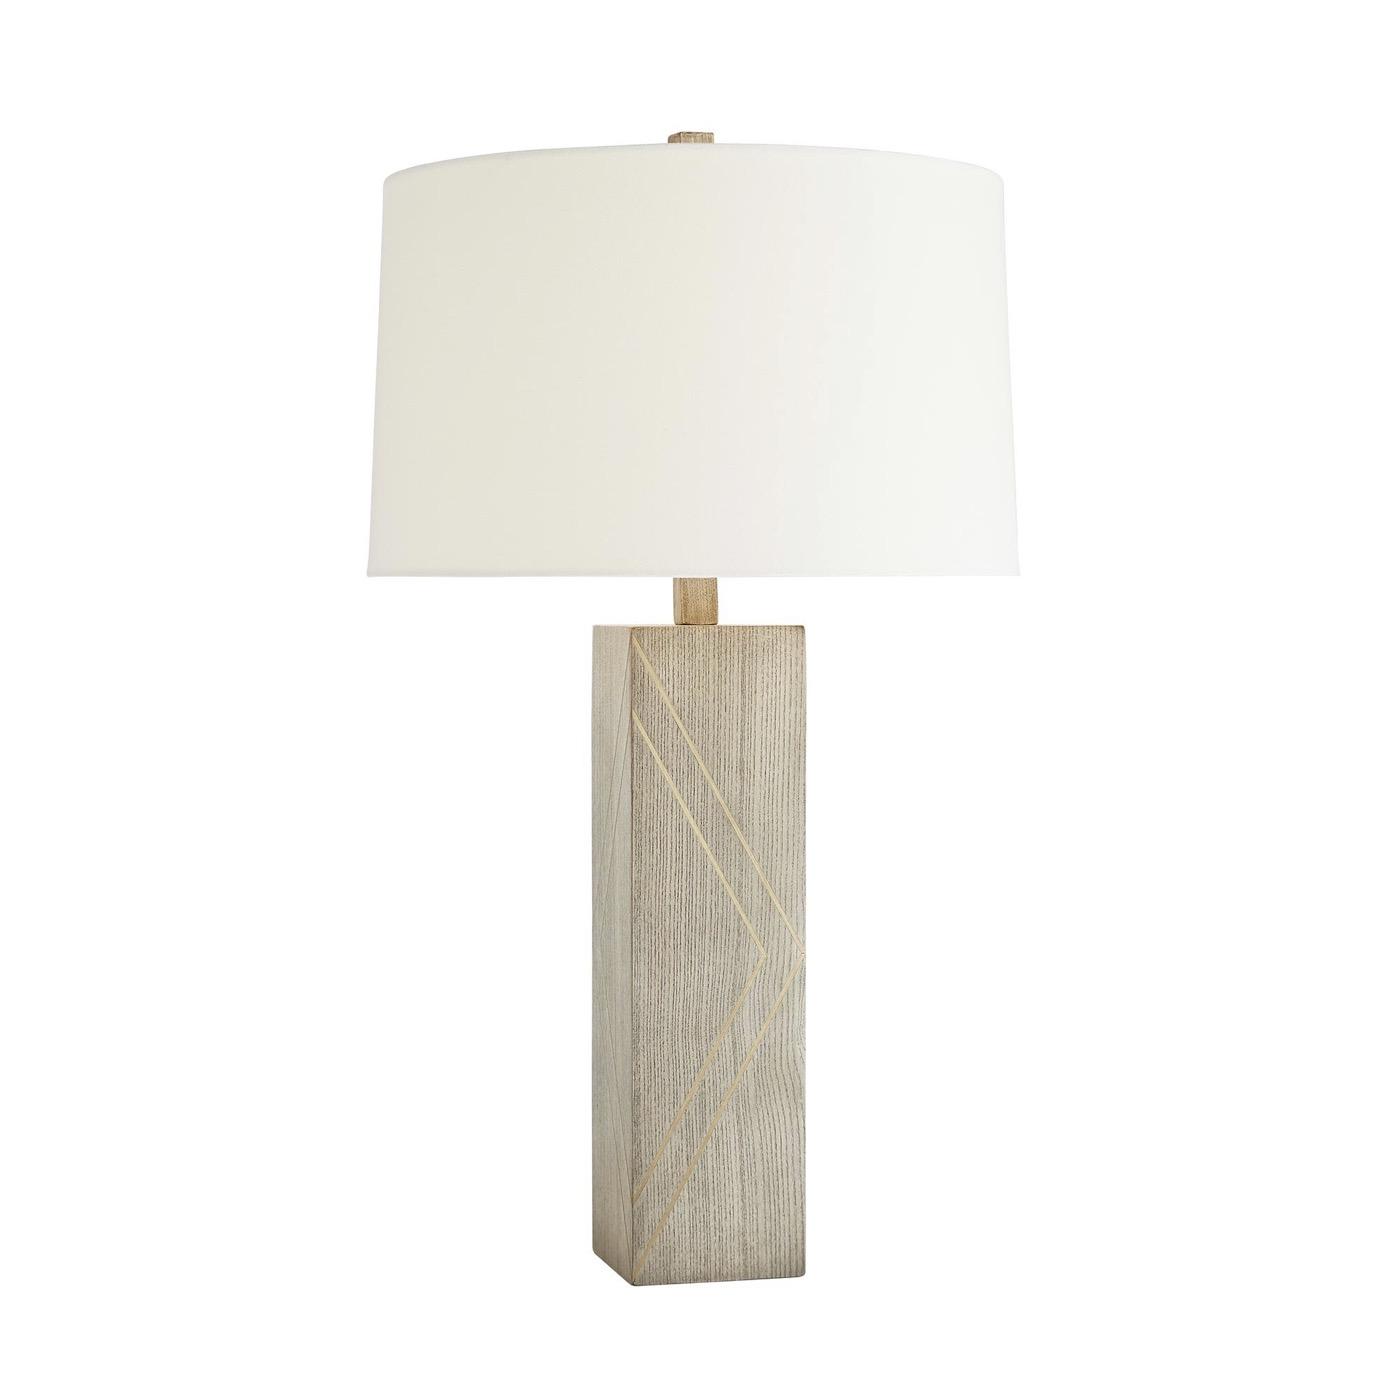 Vidal Wooden Table Lamp